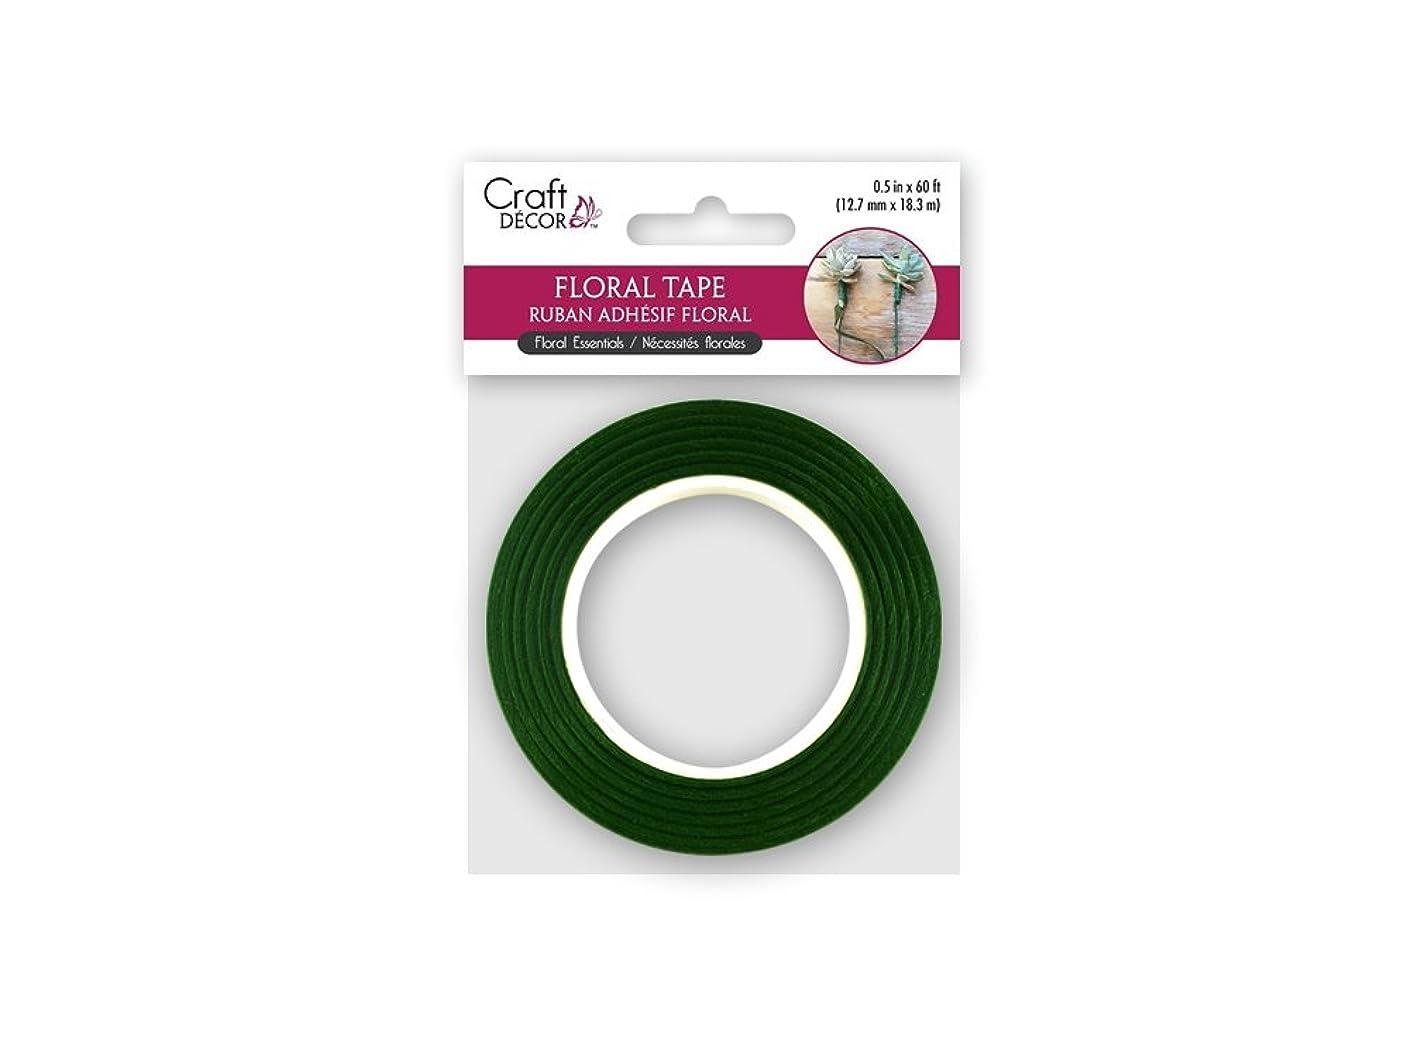 Craft Décor FL013A Floral Tape Stem Wrap: 0.5in x18.2m, Green